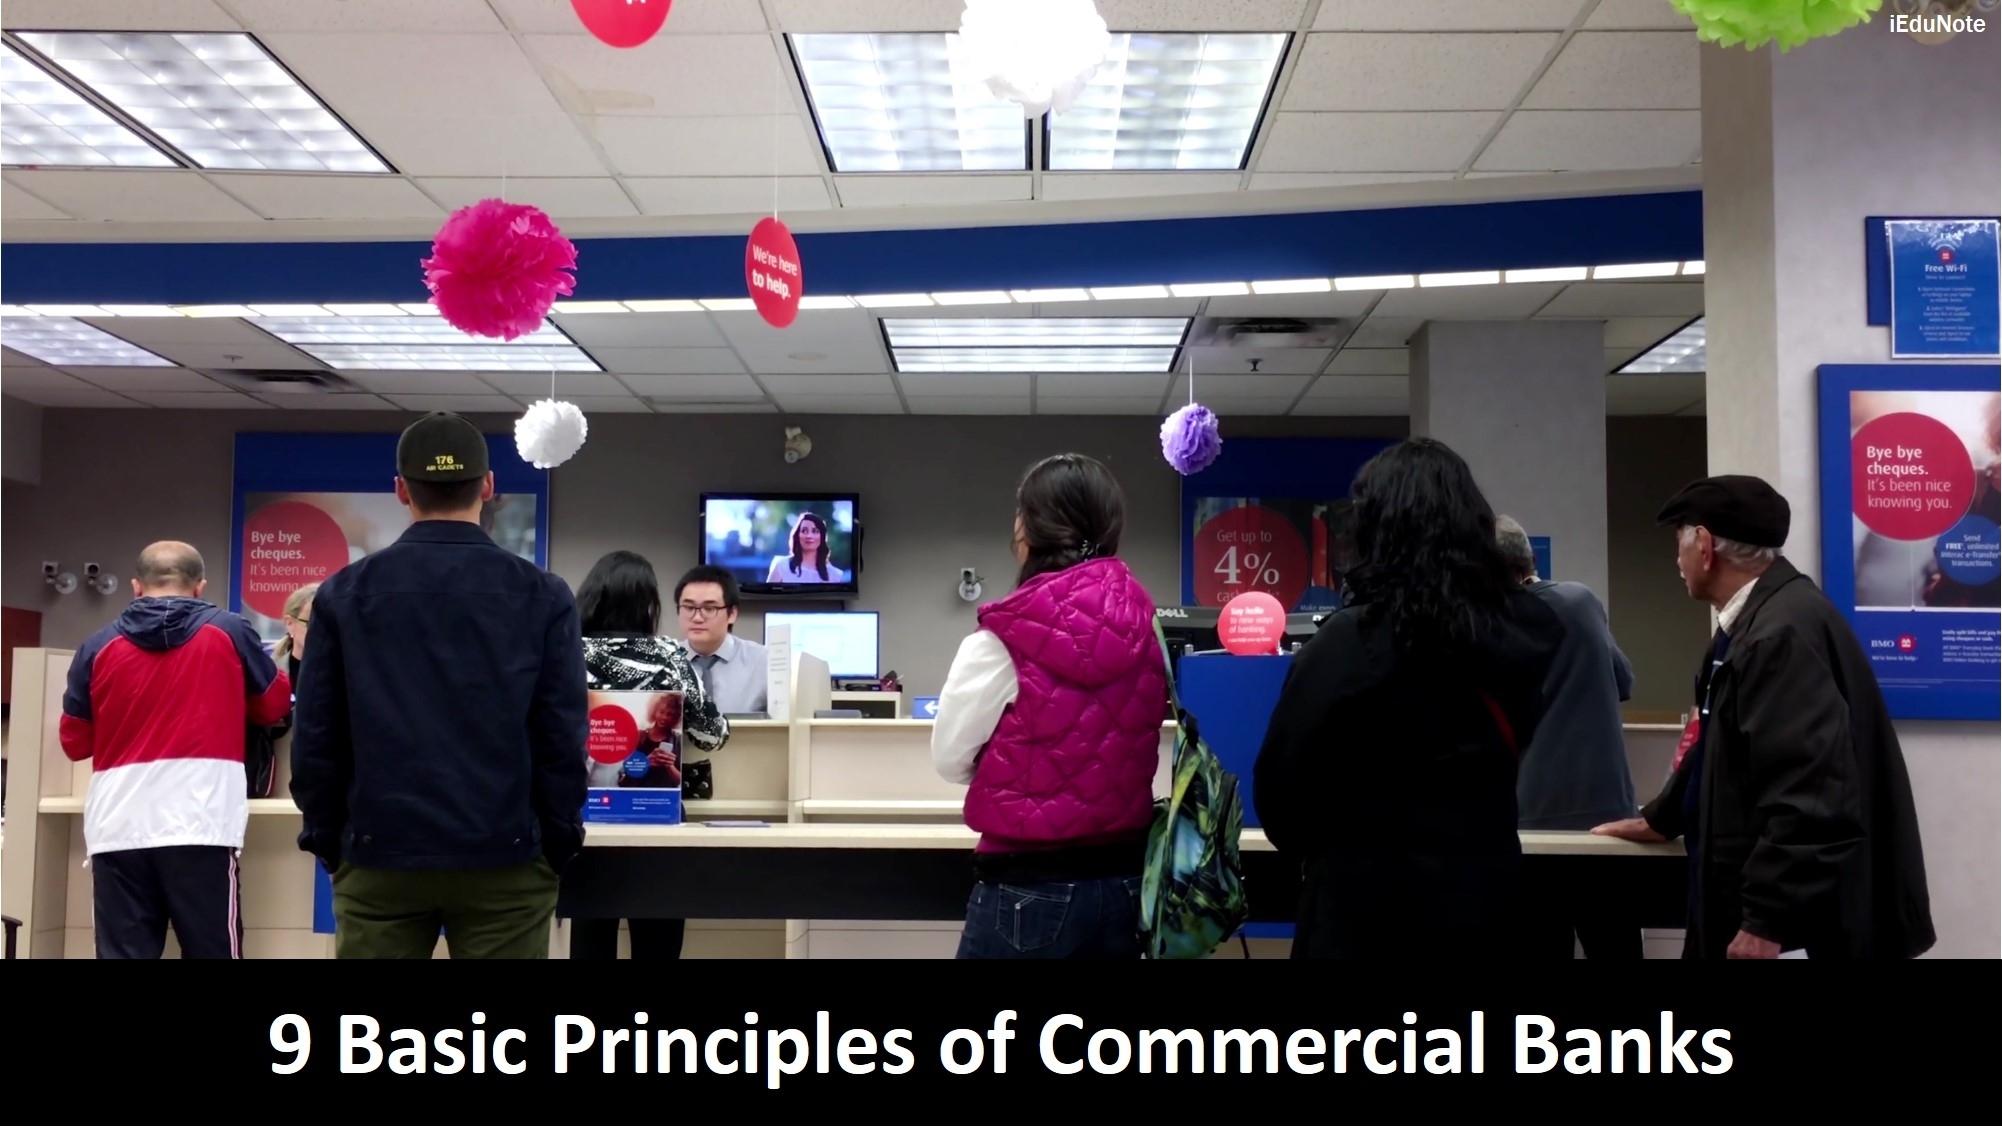 9 Basic Principles that Commercial Banks Follow